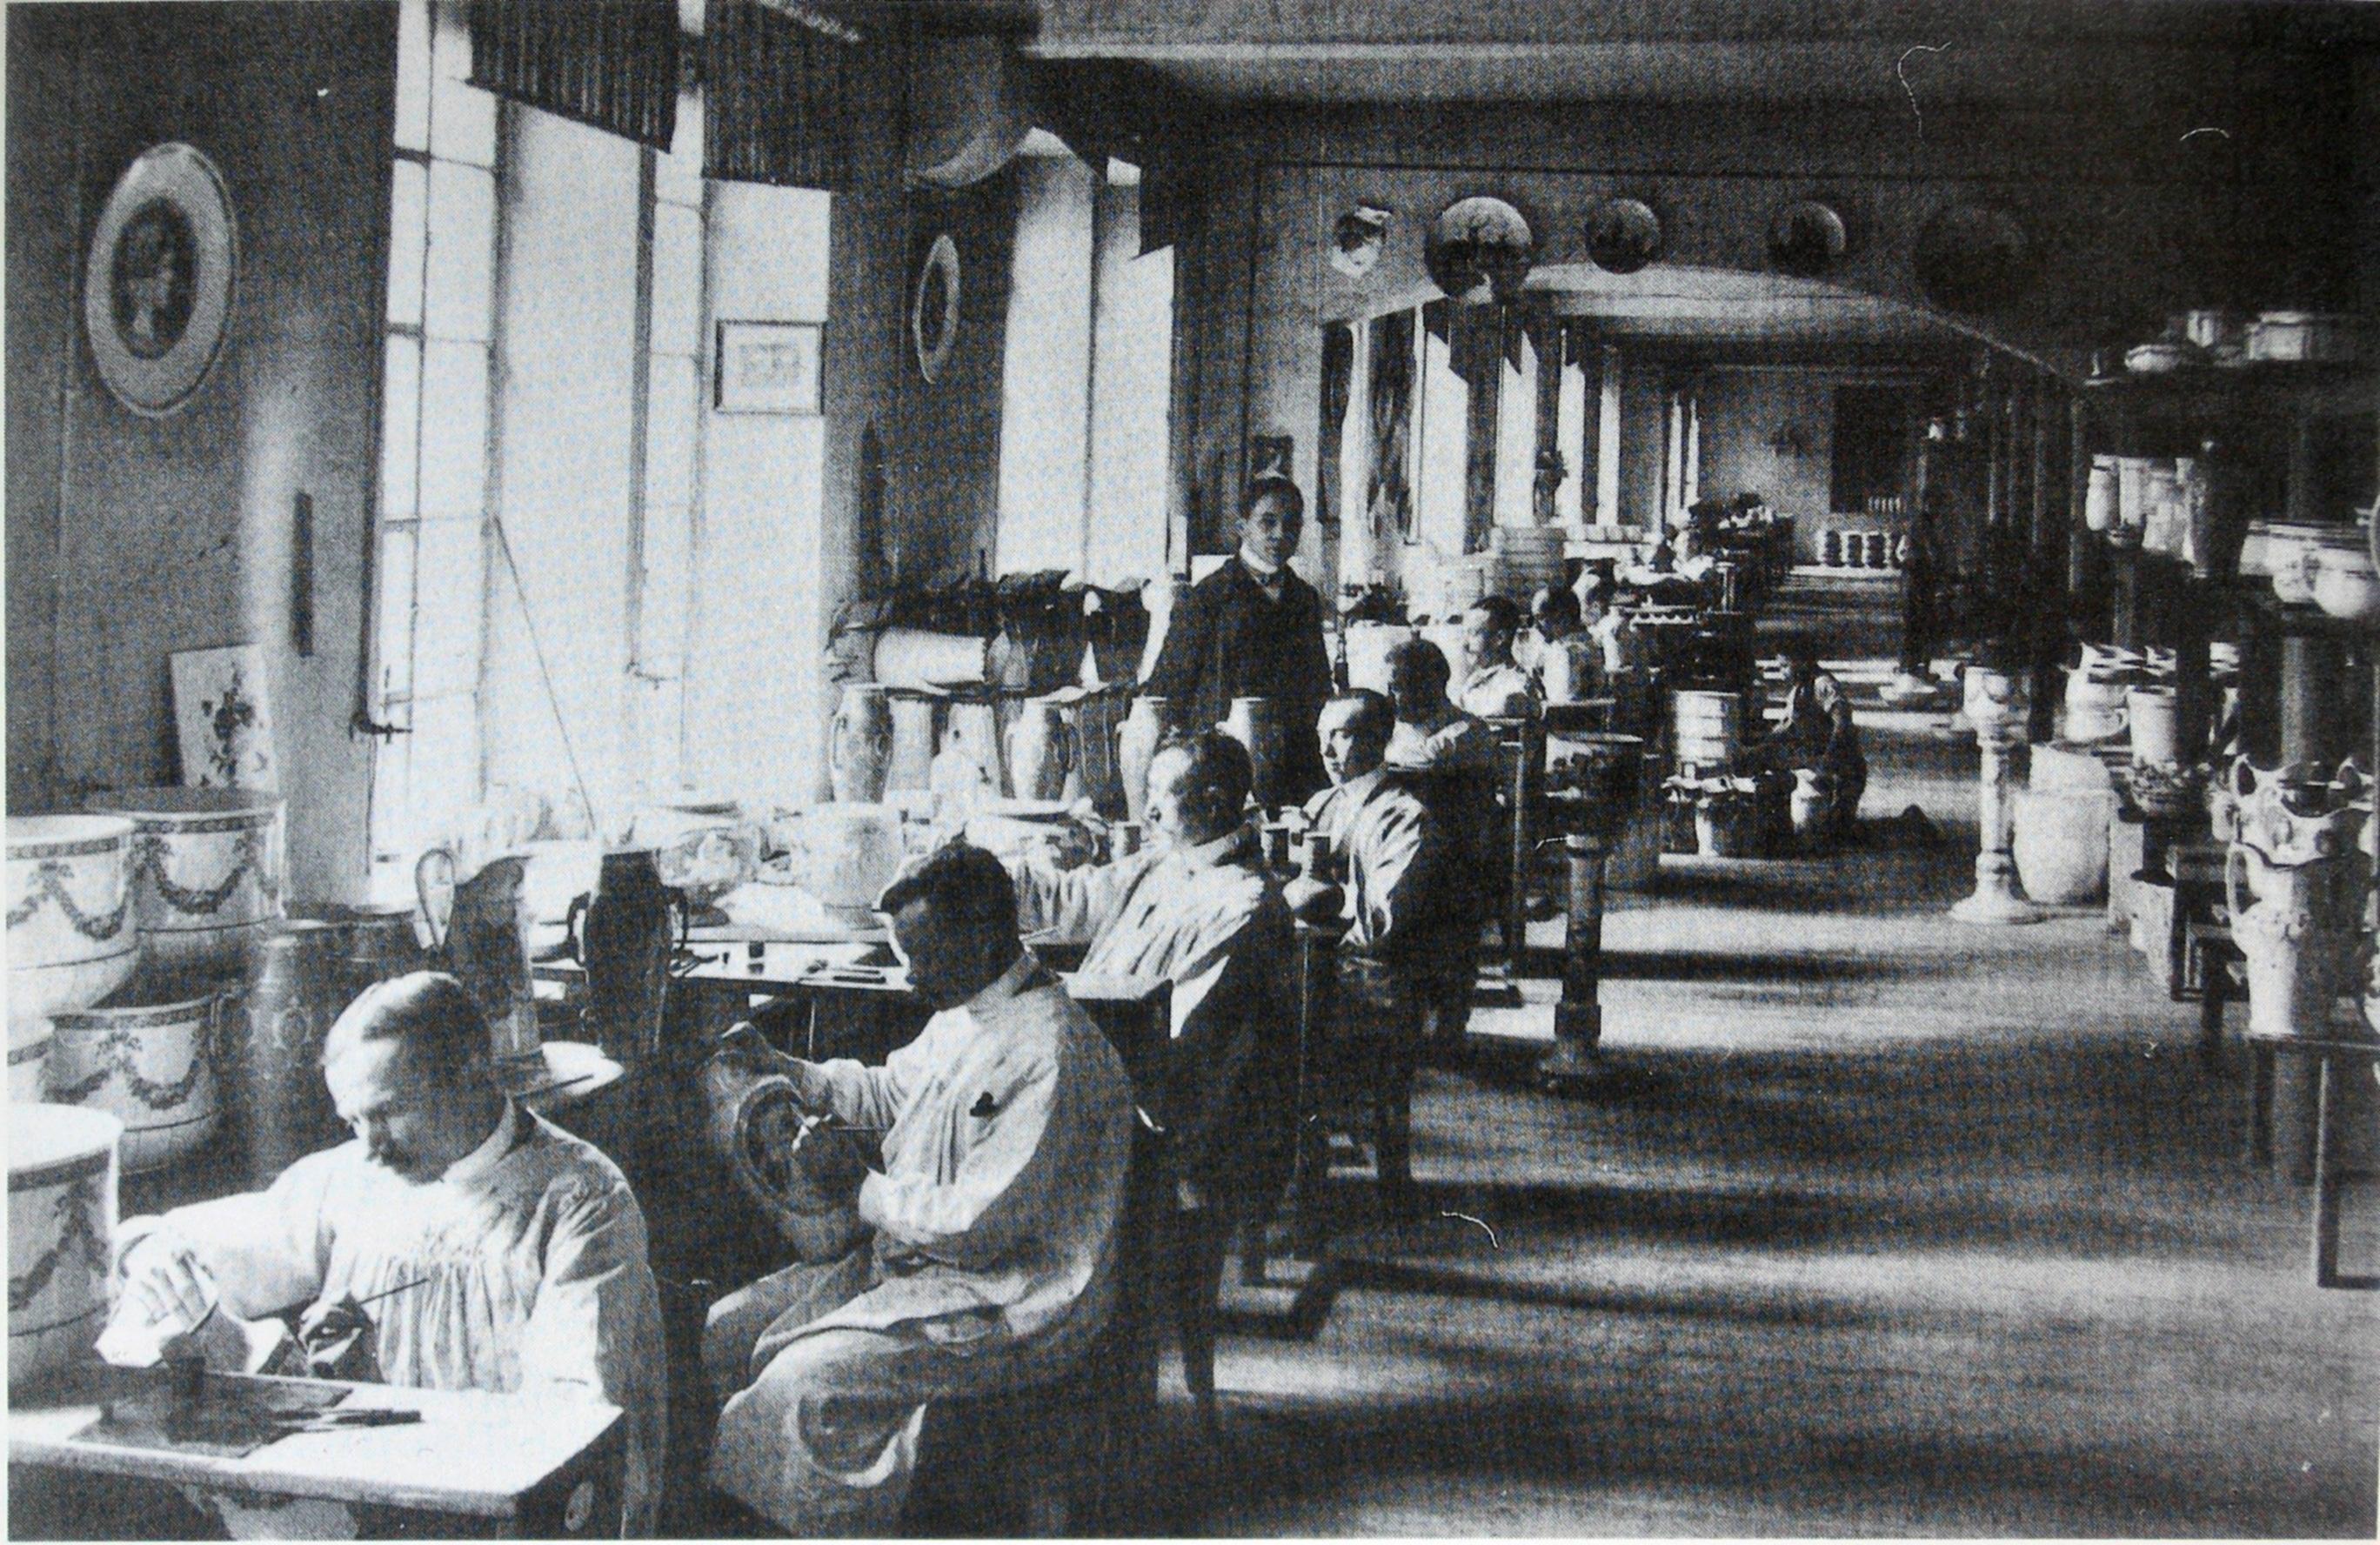 VilleRoy_Boch_Keramikmaler_1893 Luxus Villeroy Und Boch Keramik Dekorationen